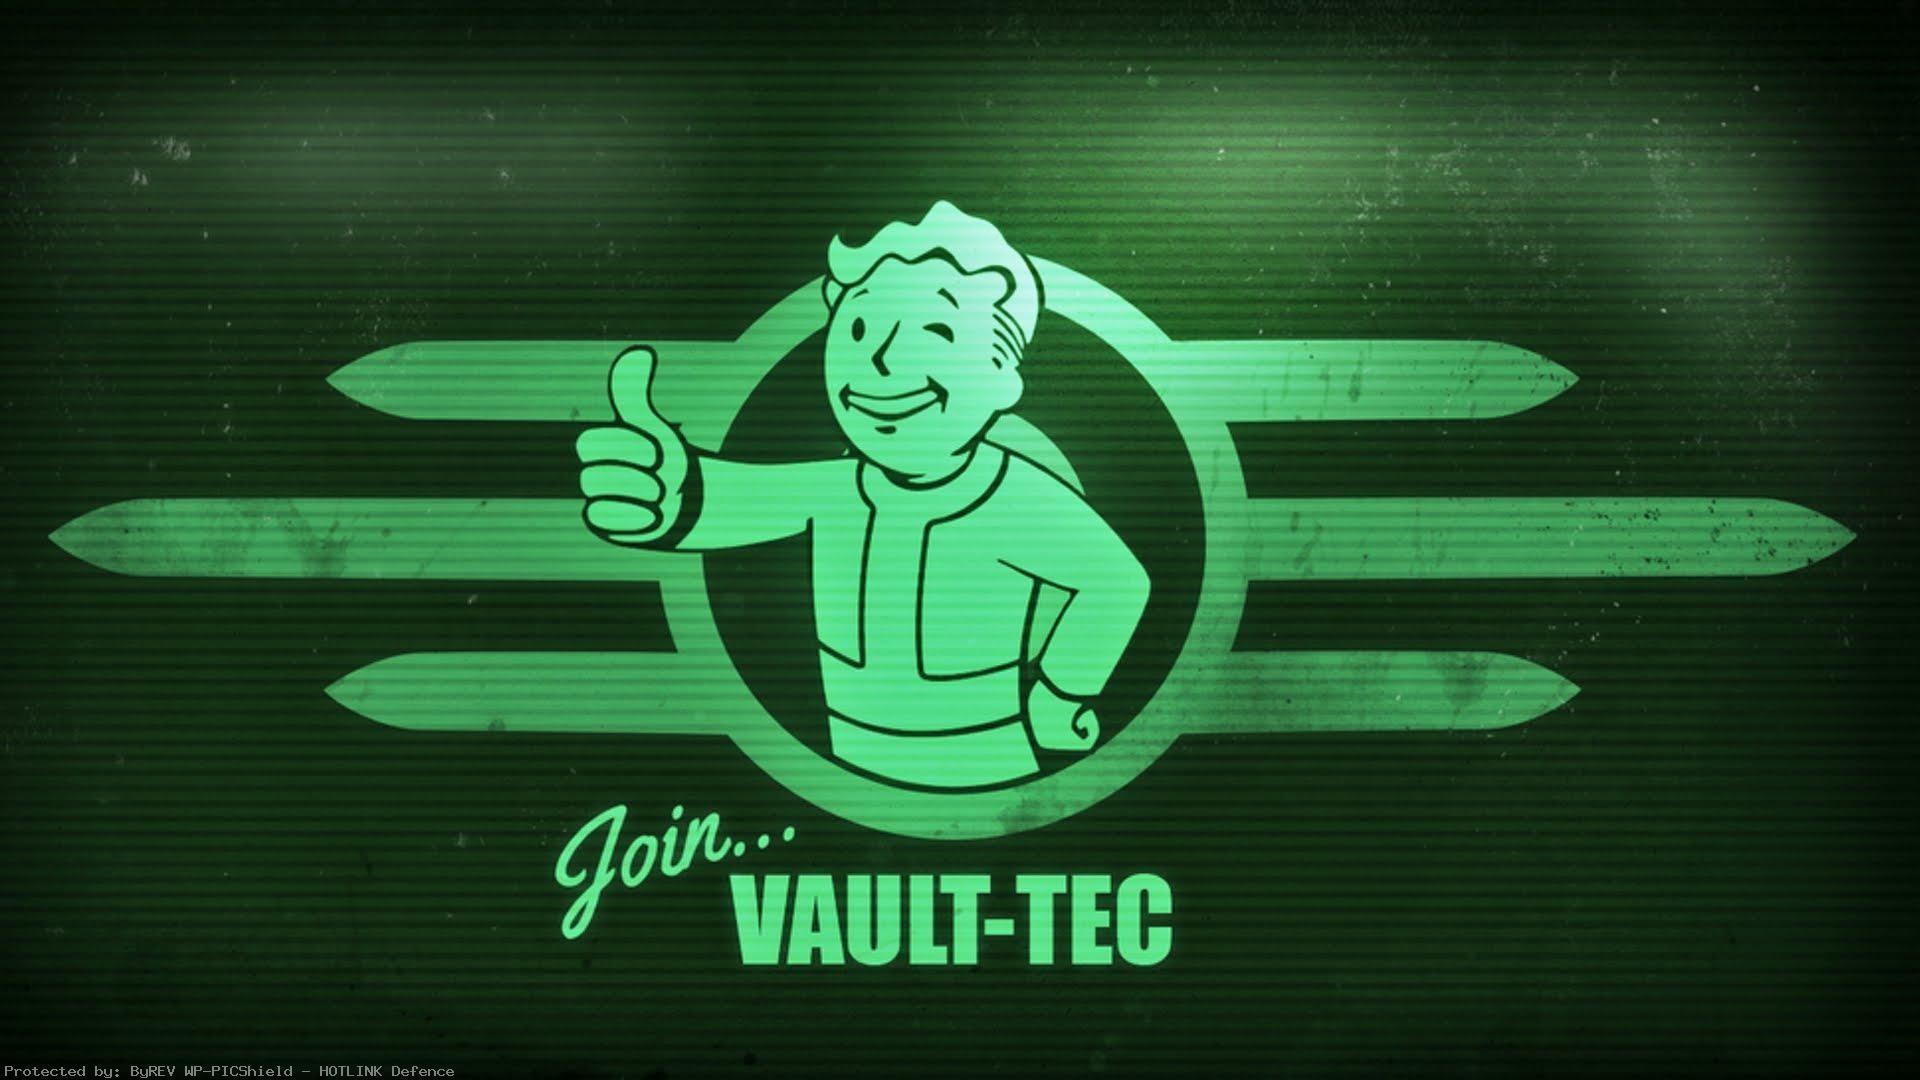 IPhone-Fallout-HD-Desktop-Backgrounds-1920%C3%971080-